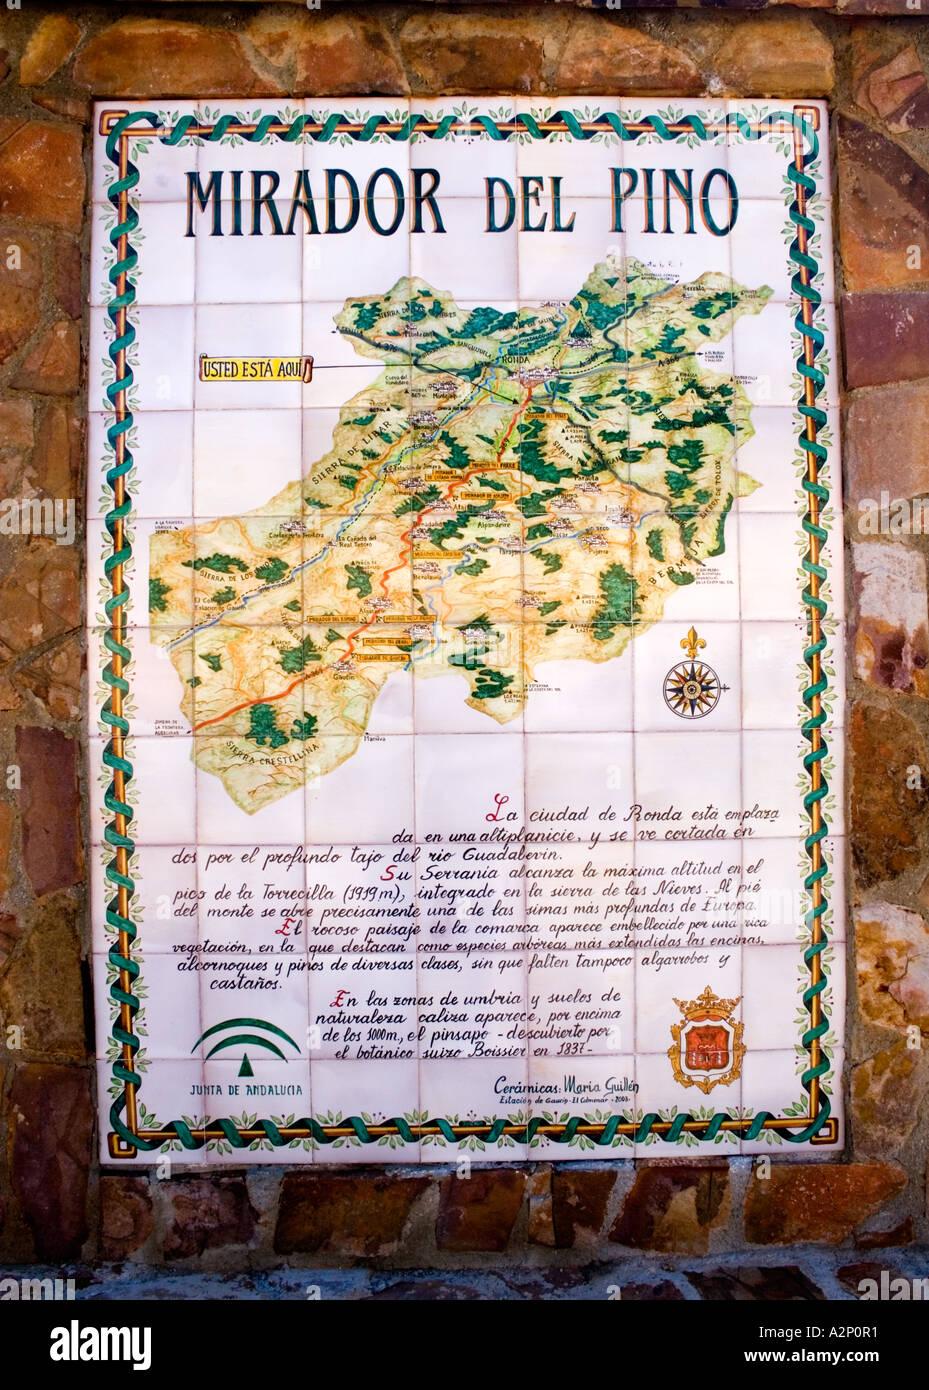 Tiled Tourist Map Nr Ronda Spain Stock Photo 6039152 Alamy